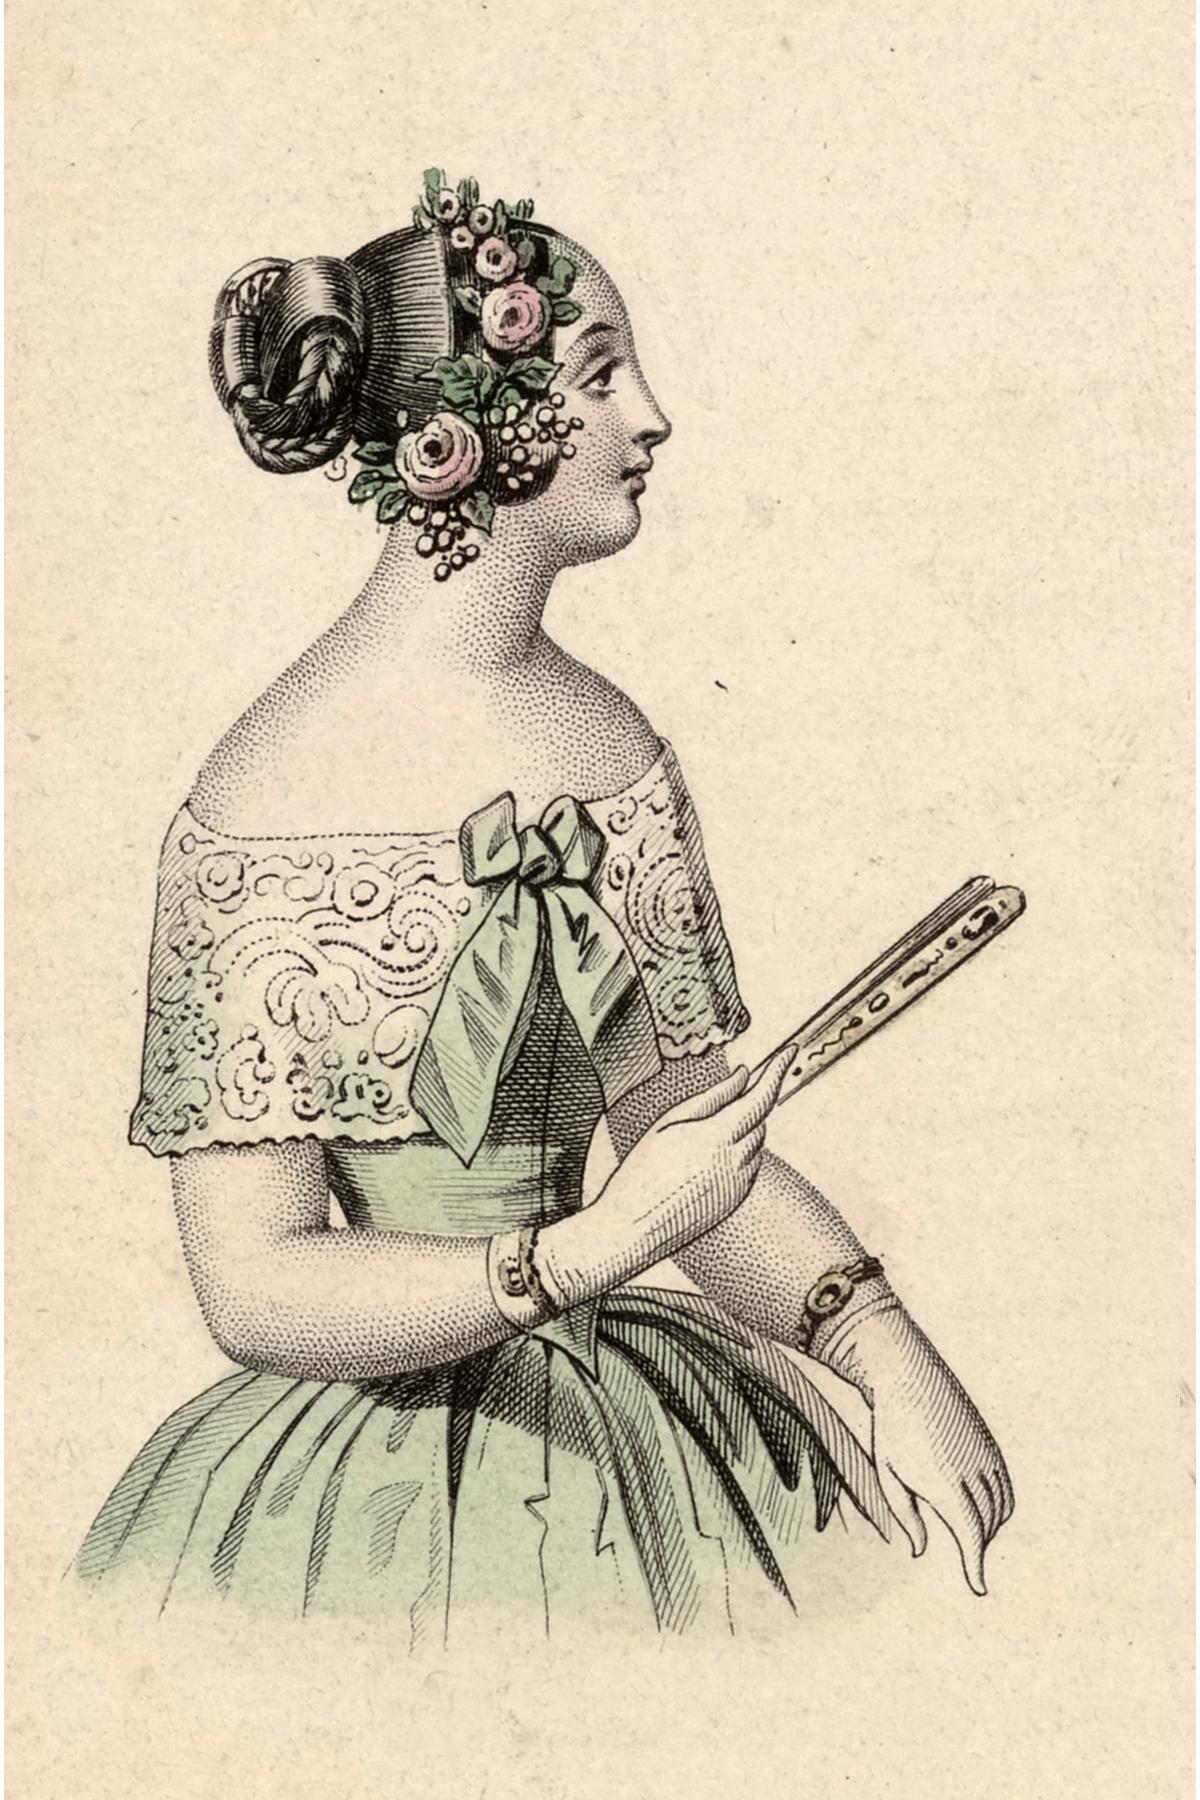 Vintage Lady Holding A Fan Image